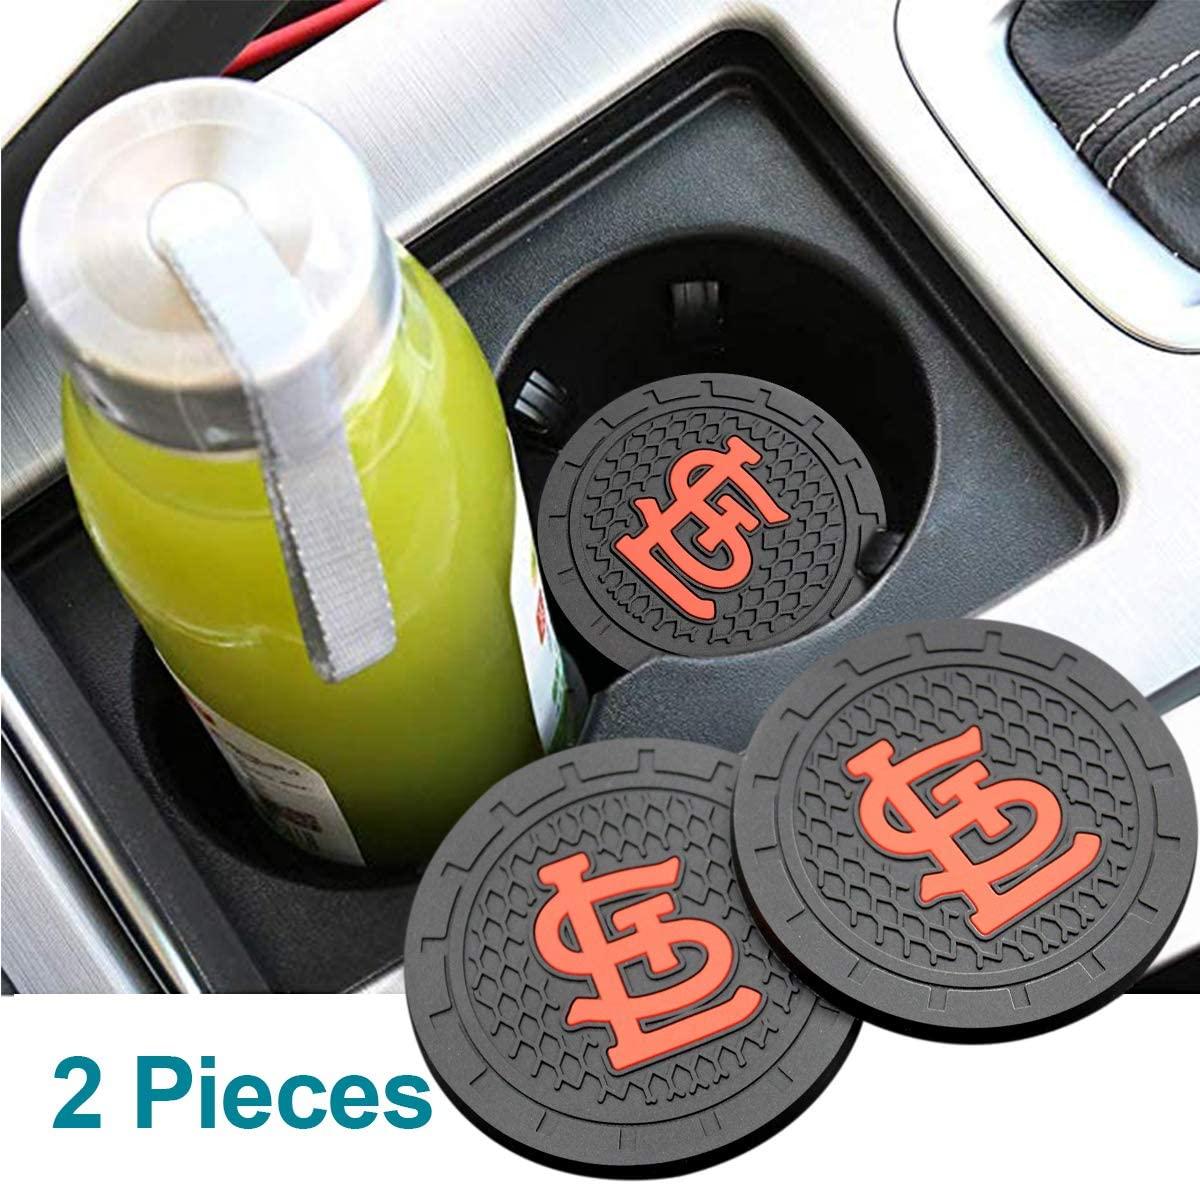 Wall Stickz AutoParts 2PCS 2.75 Inch Slip Cup Coaster Cup Holder Mat Durable Car Interior Accessories (St. L Cardin)